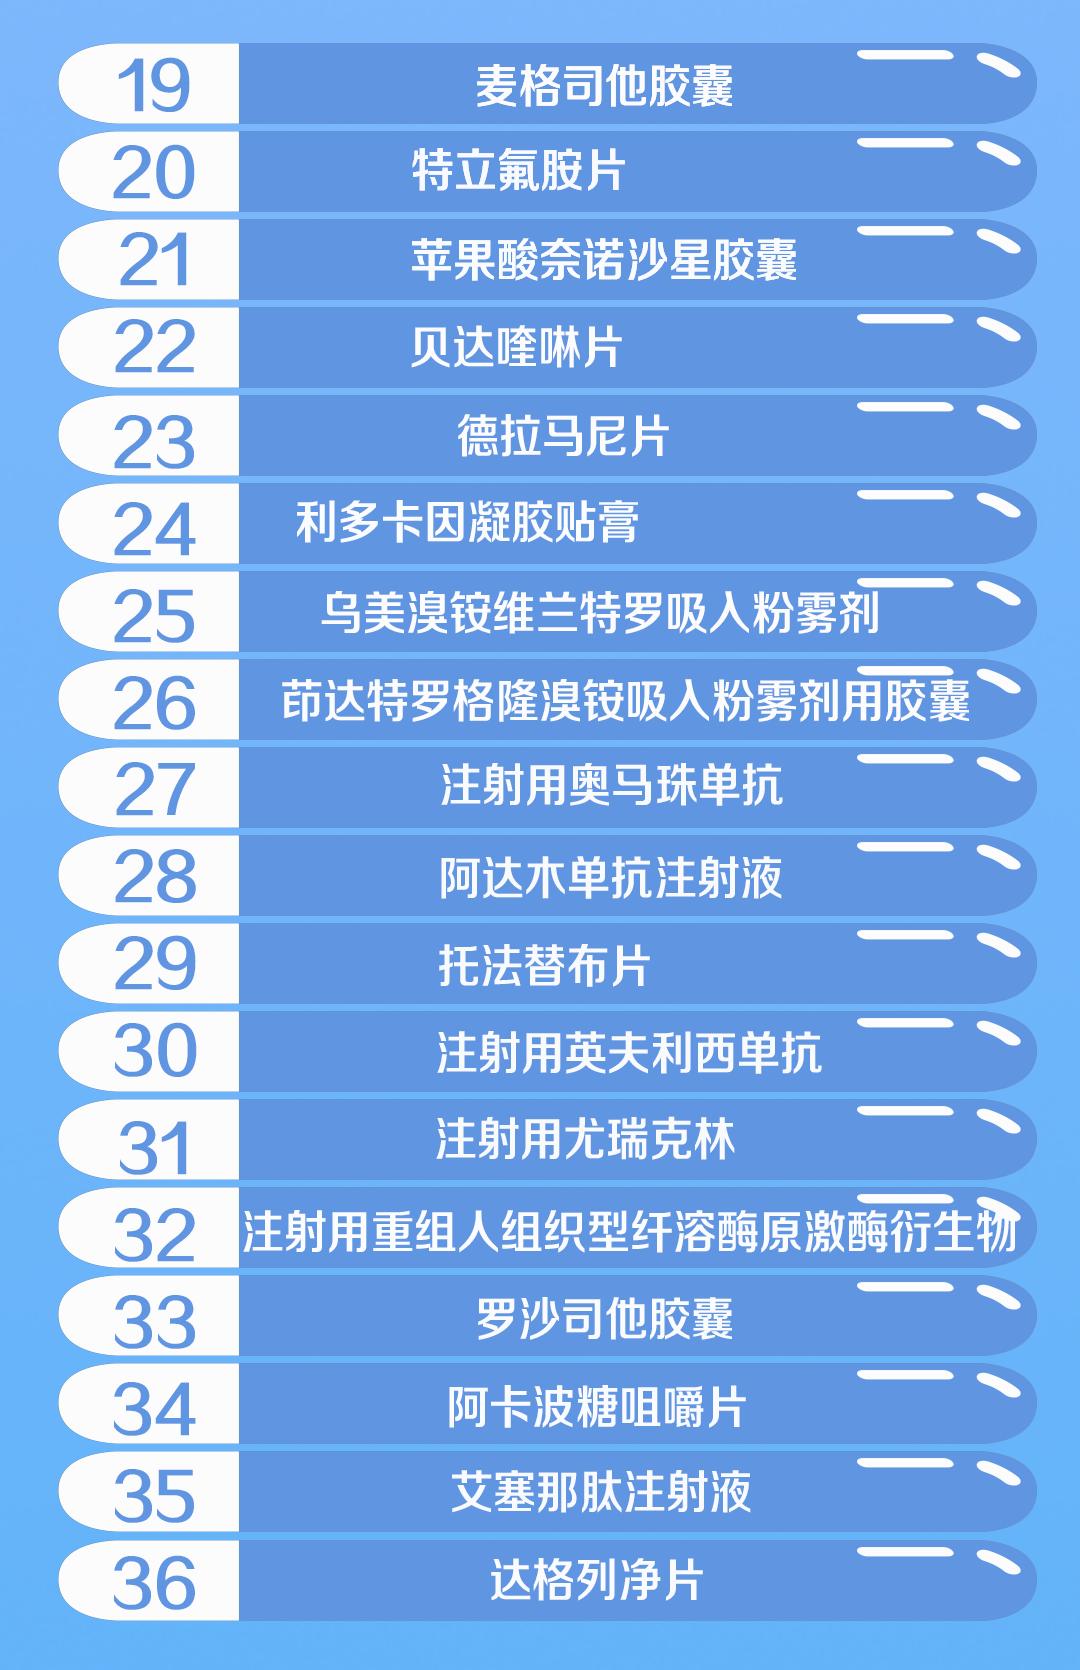 ag平台国际厅地址,第13届中国(深圳)私募基金高峰论坛3月21日-23日举行